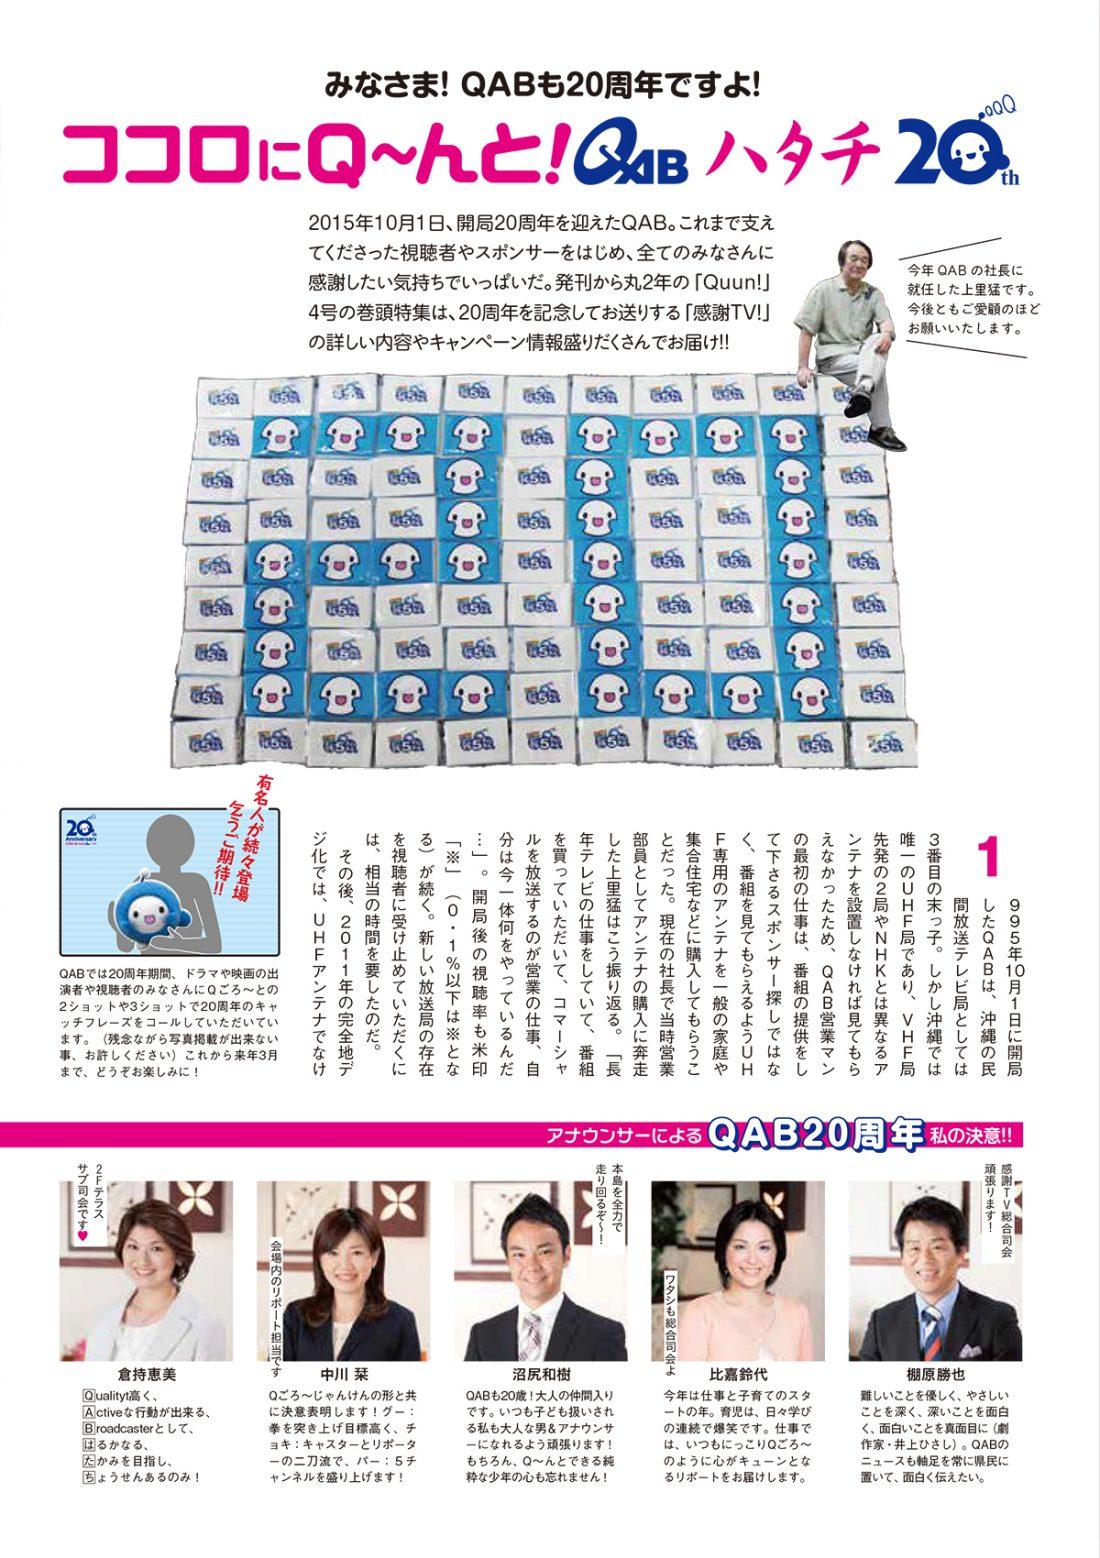 https://www.qab.co.jp/qgoro/wp-content/uploads/quun_0402-1100x1558.jpg